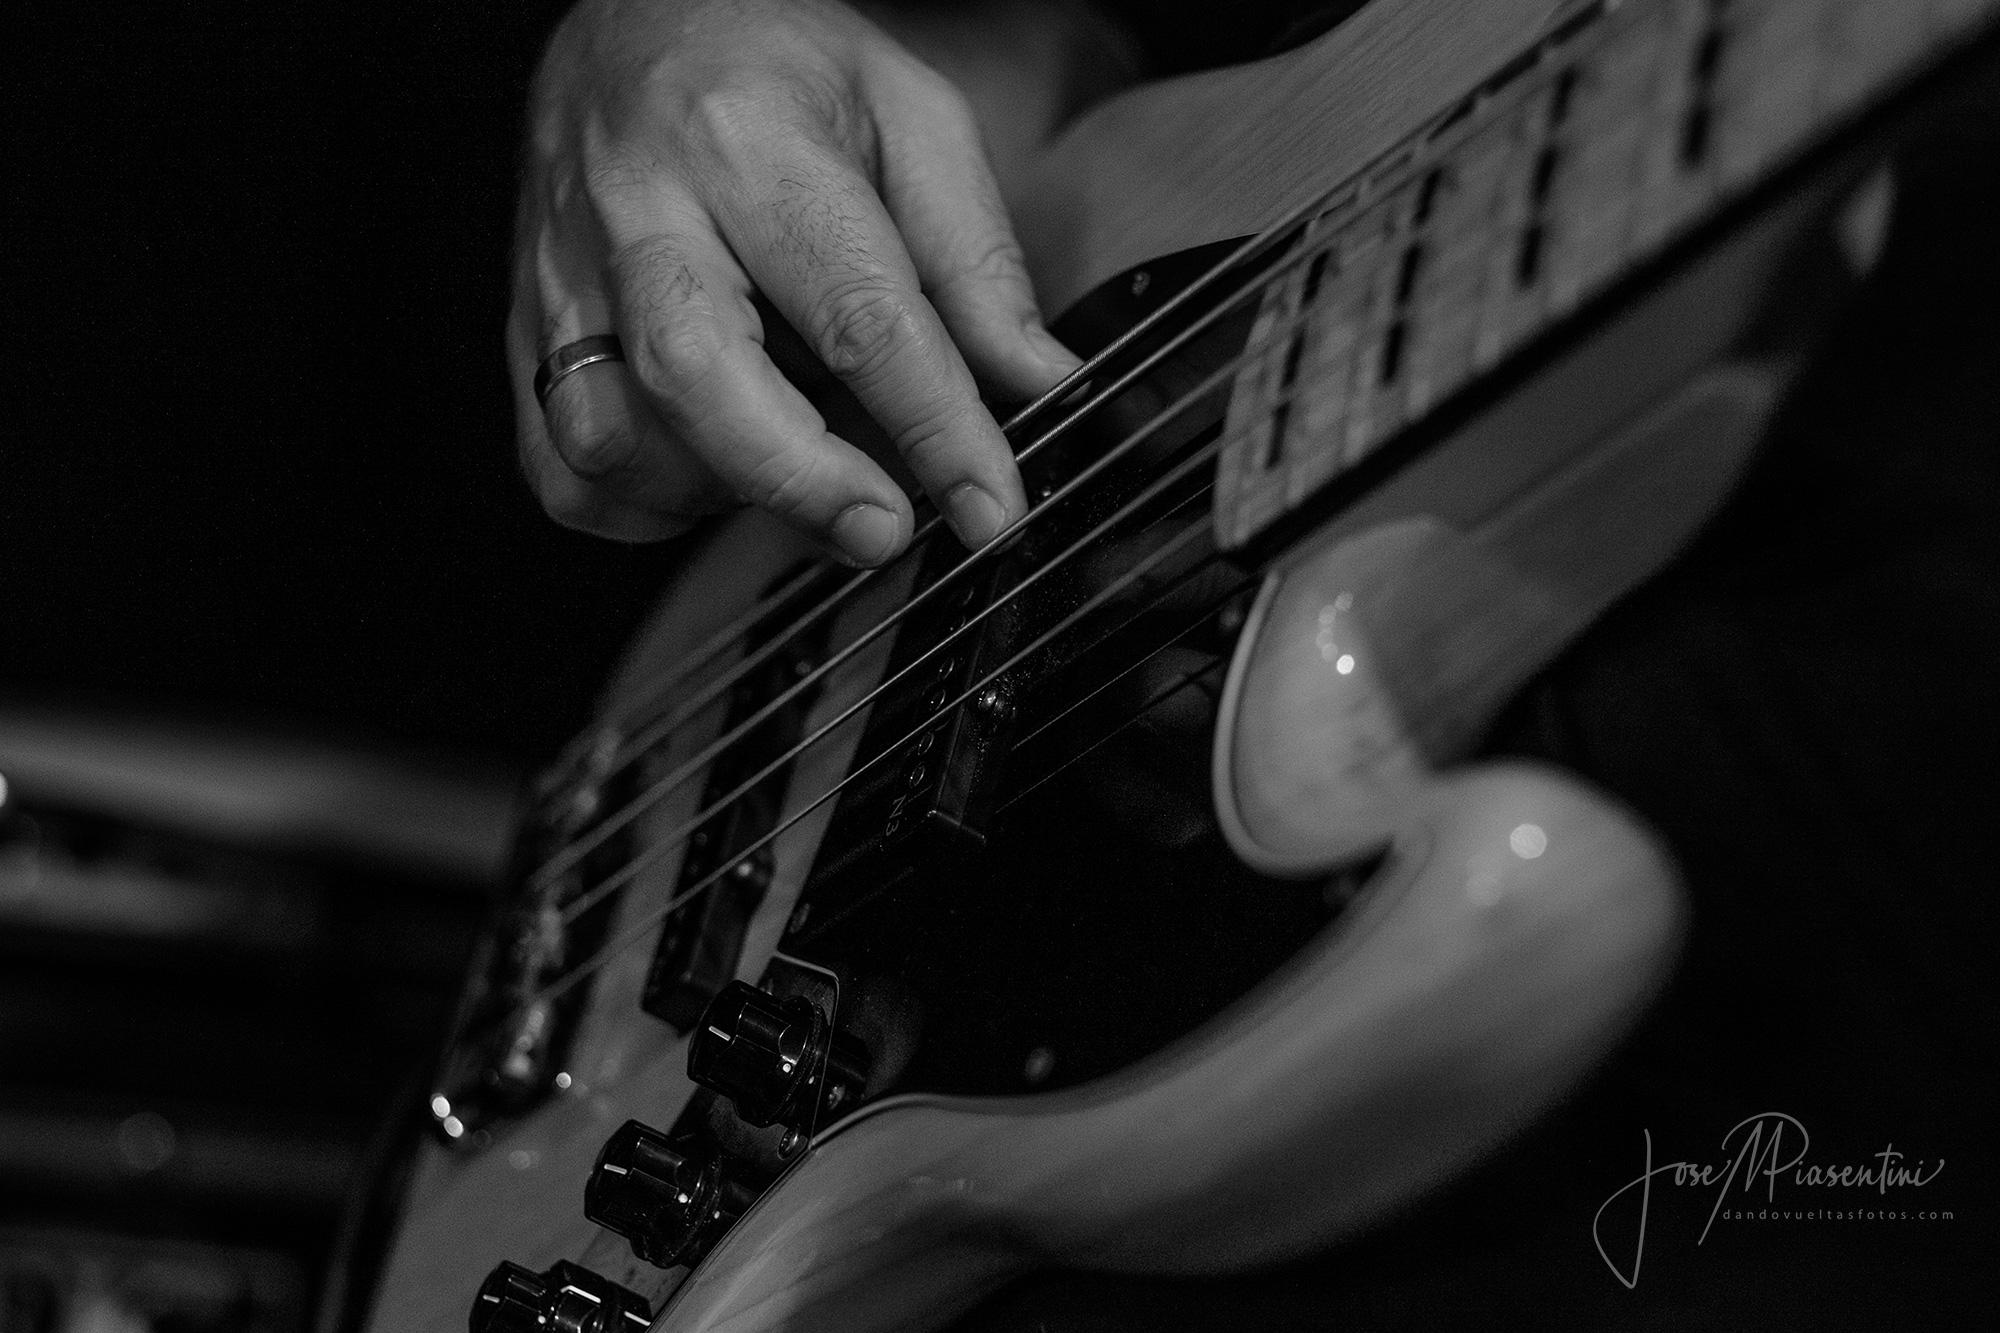 The-harlembar-session-jam